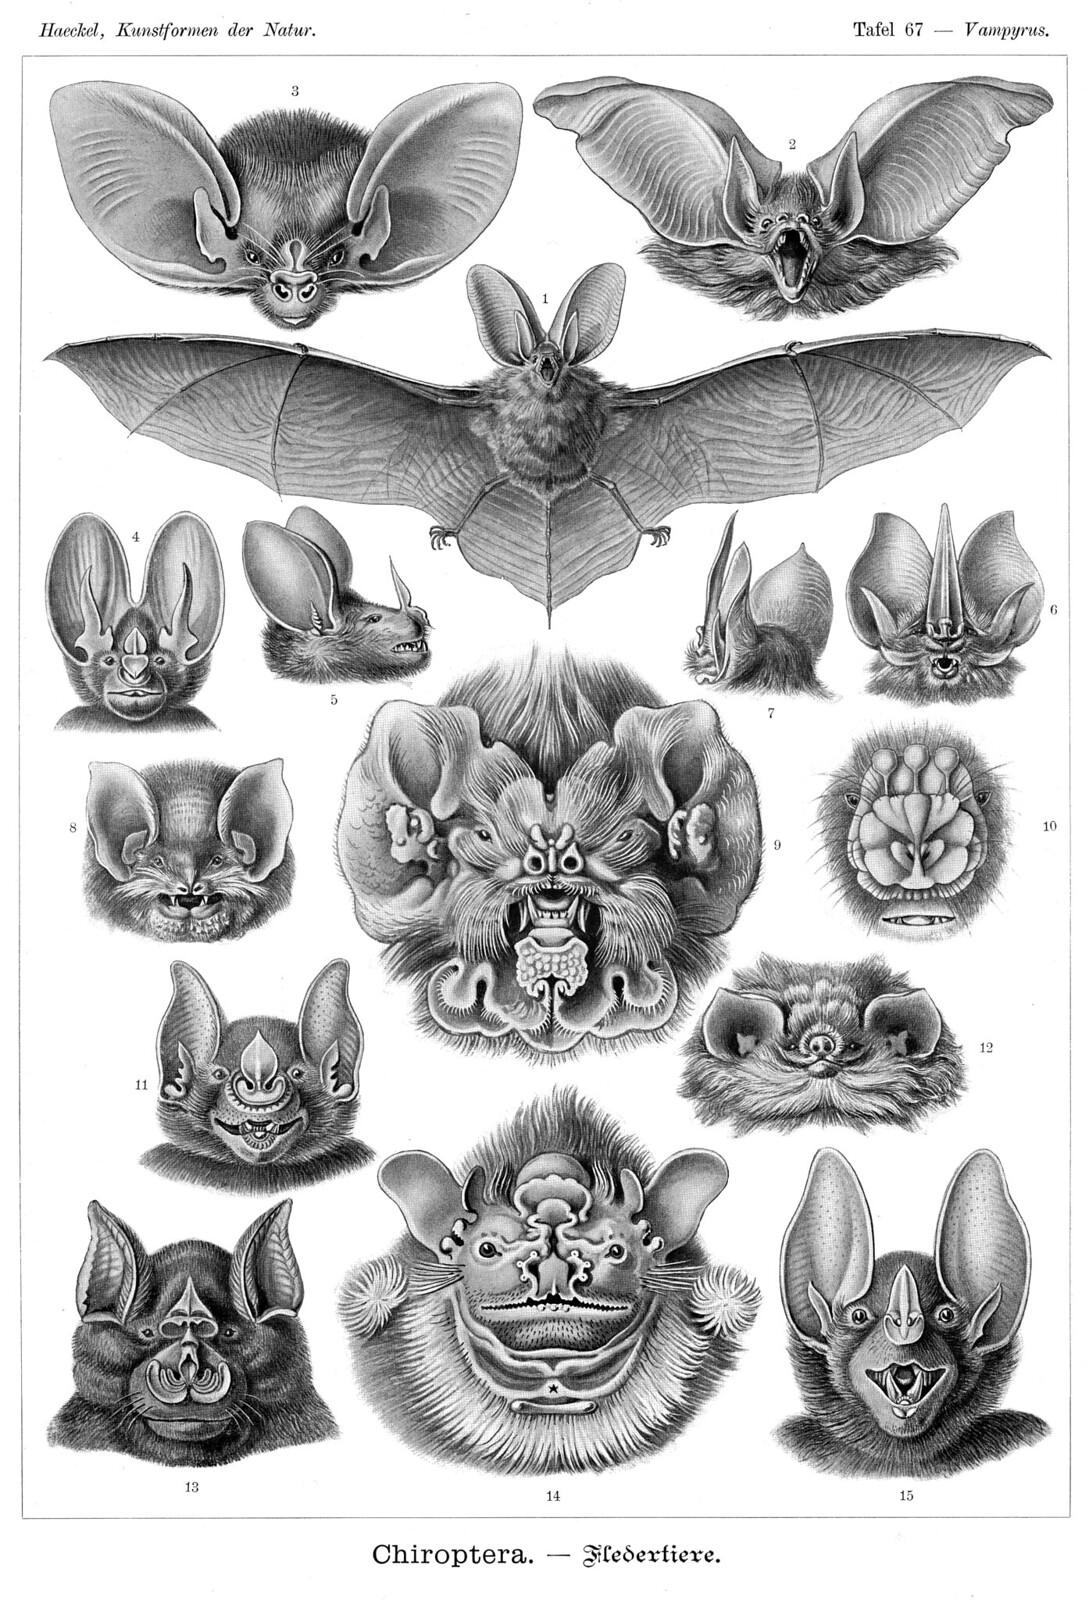 ernst haeckel s bats 1904 the public domain review. Black Bedroom Furniture Sets. Home Design Ideas